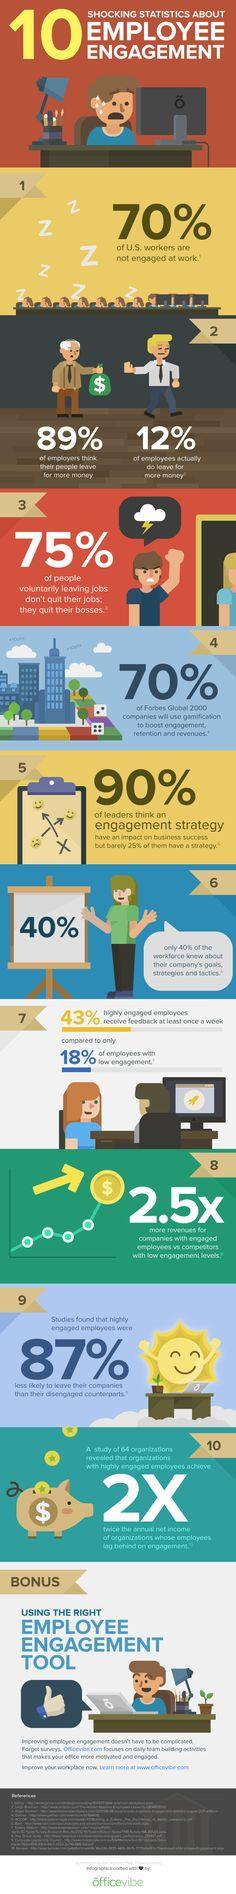 10 Shocking Statistics About Employee Engagement  #Infographic #EmployeeEngagement #Workforce